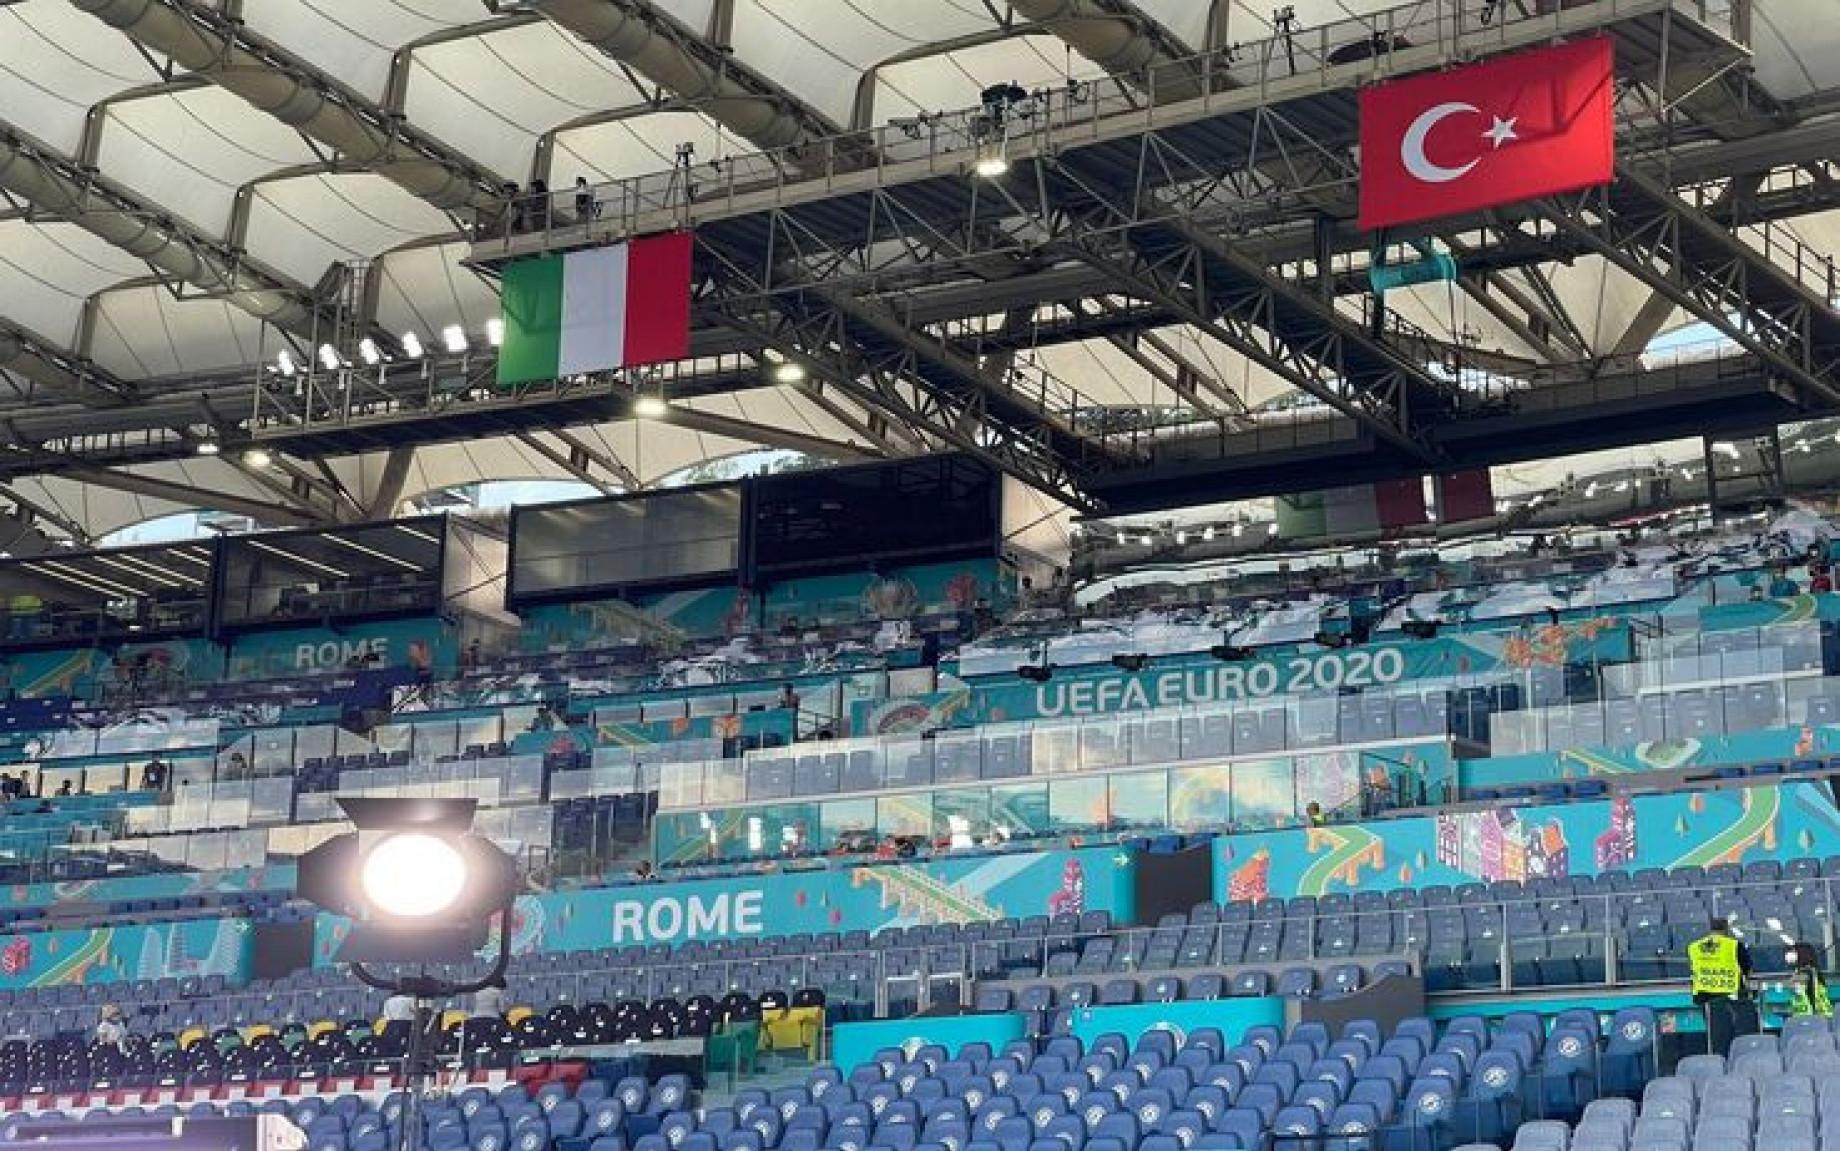 stadio-olimpico-roma-euro2020-gdm.jpeg